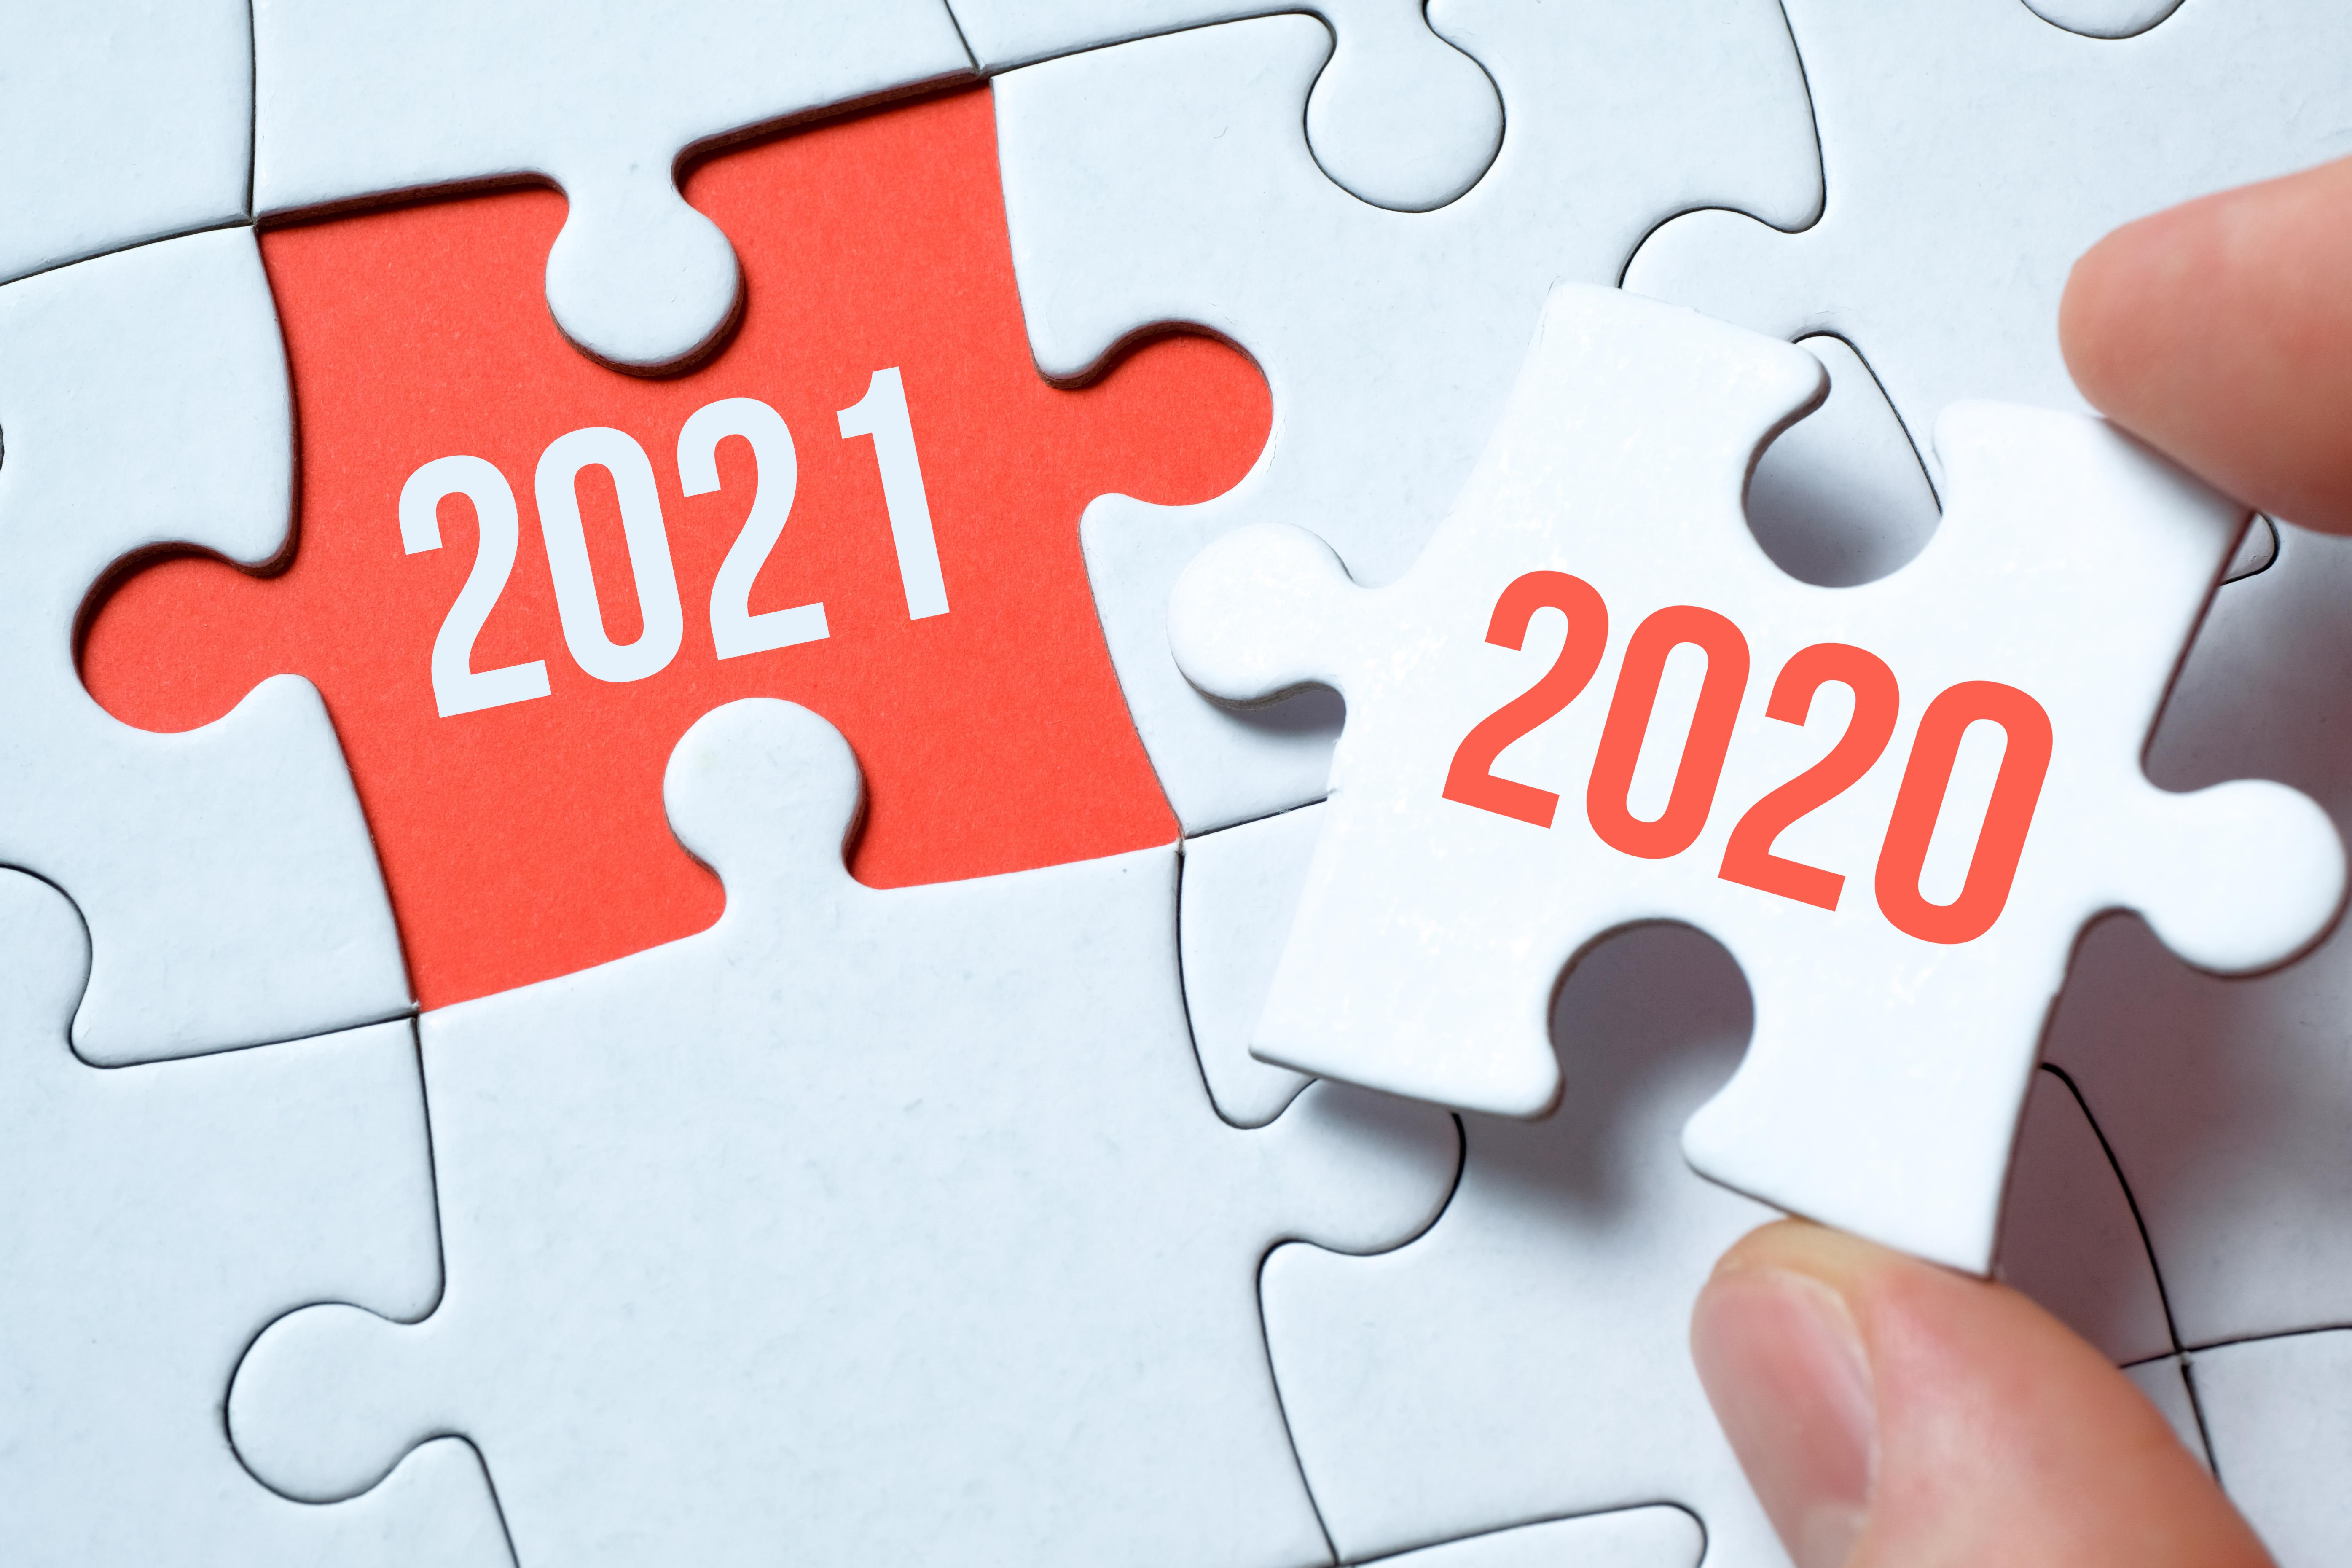 Breve resumen del año 2020